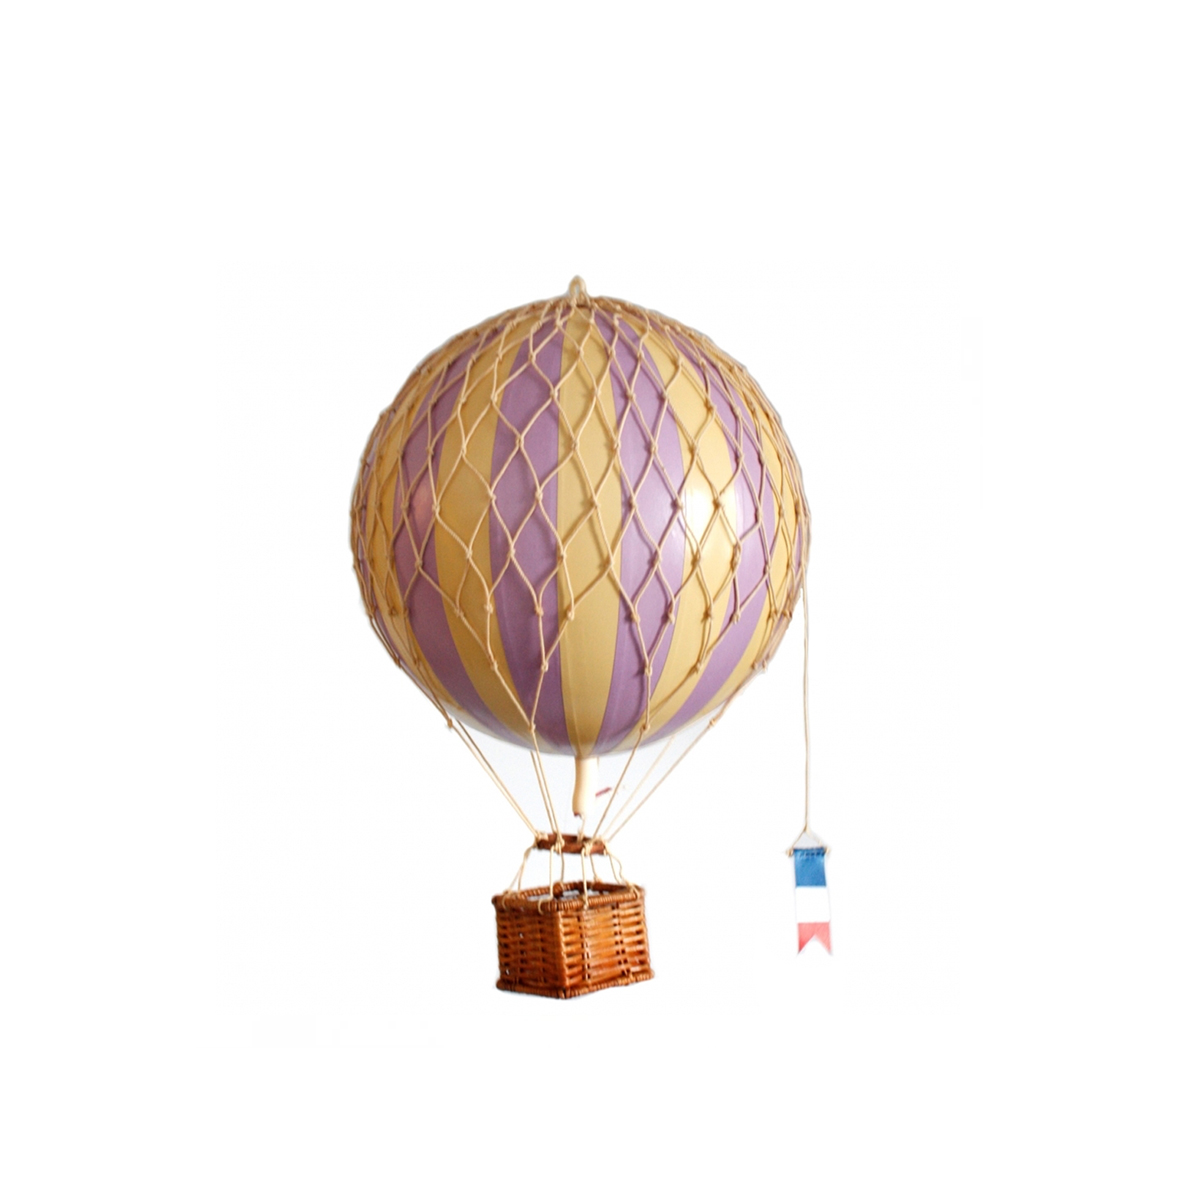 Image of Authentic Models luftballon 8,5 cm - lavender